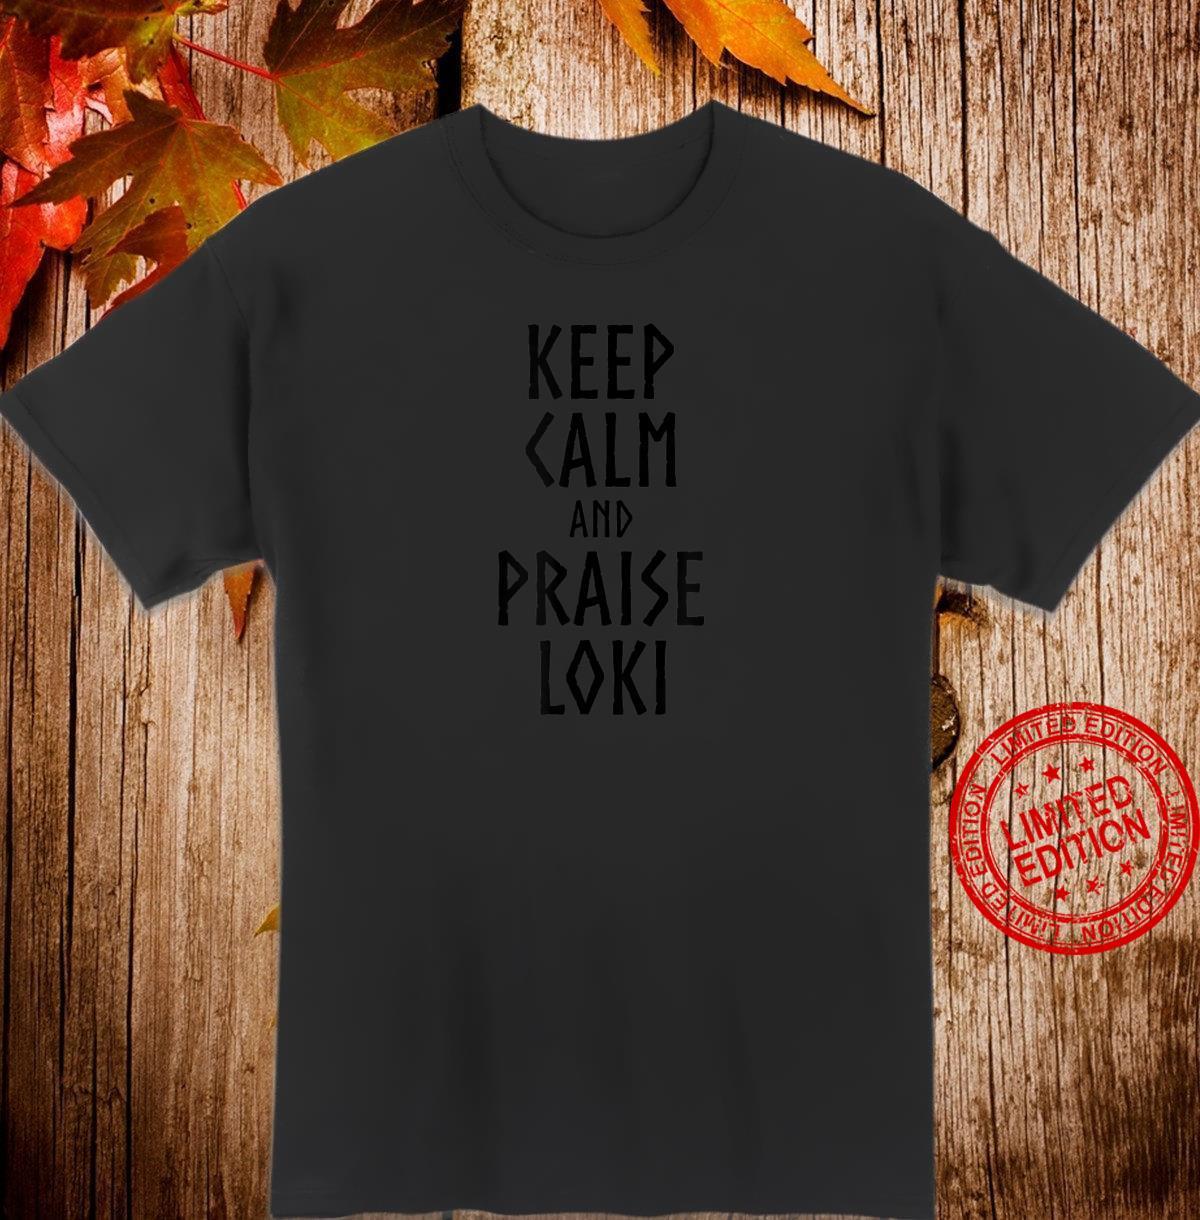 Keep Calm And Praise Loki Norse Viking Mythology Shirt